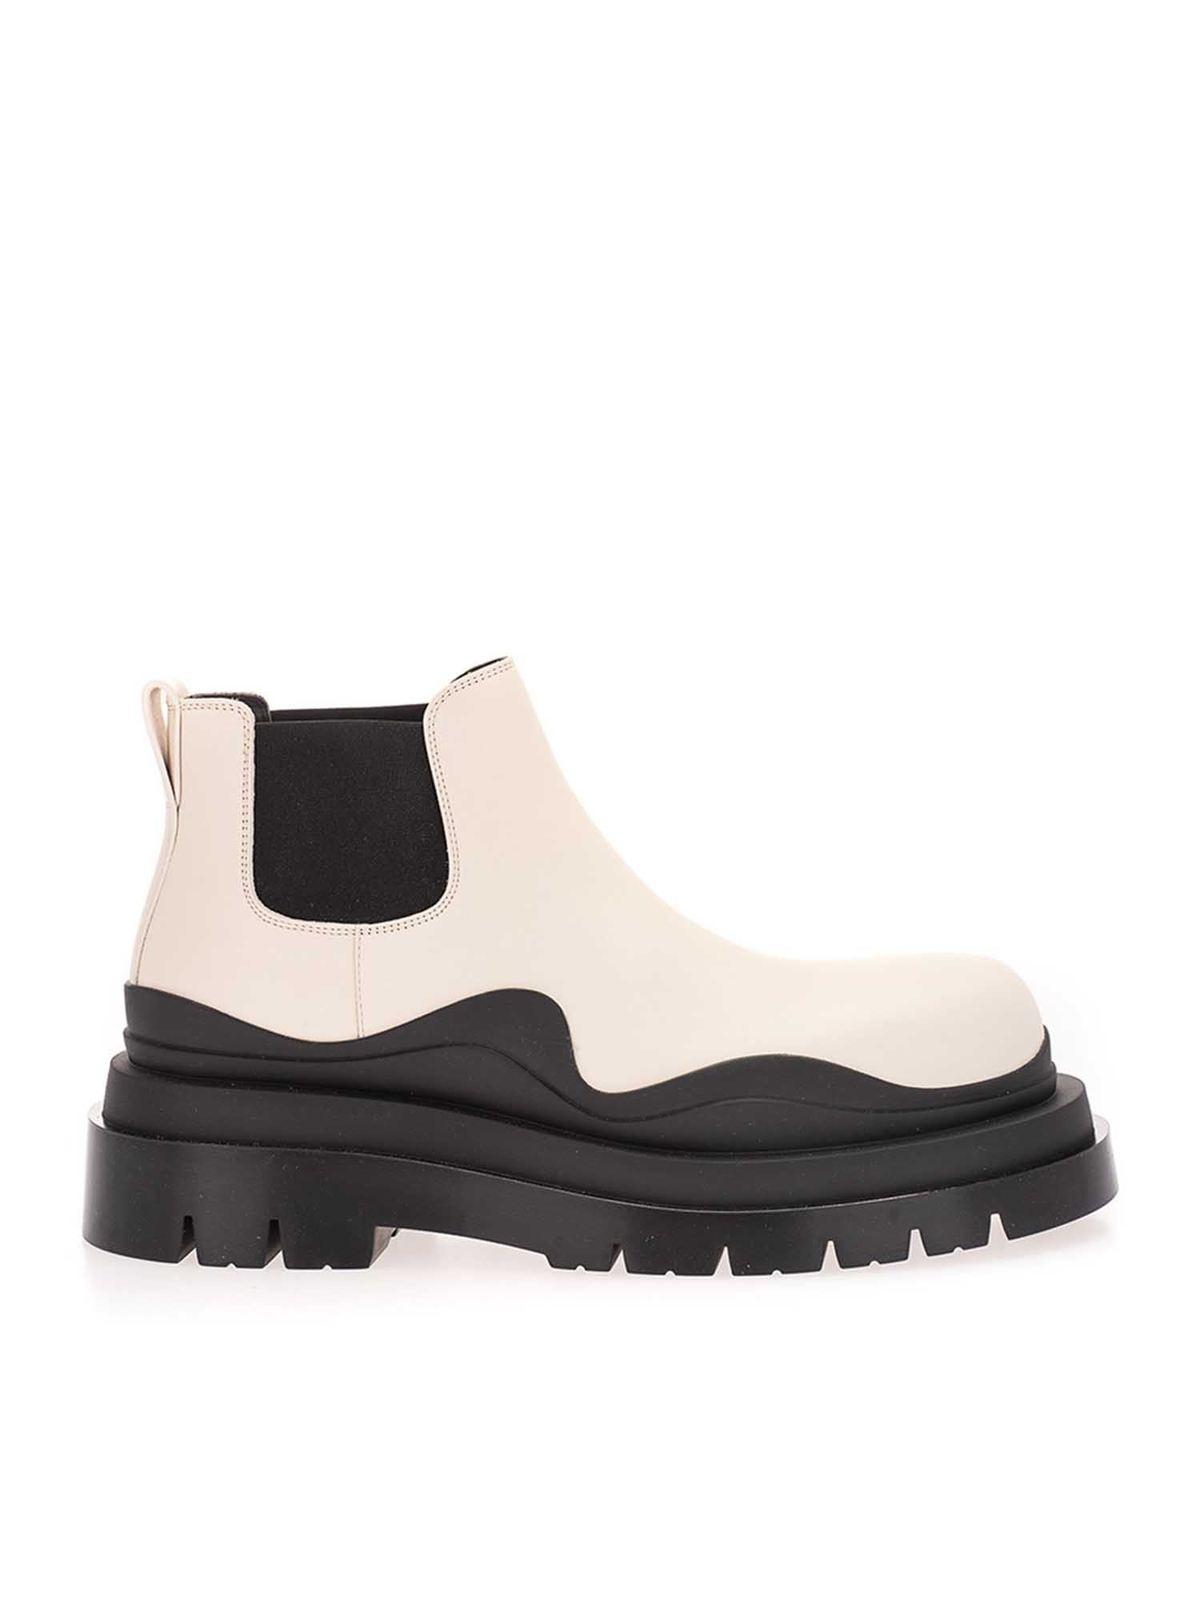 Bottega Veneta Leathers Ankle boots in black and ecru